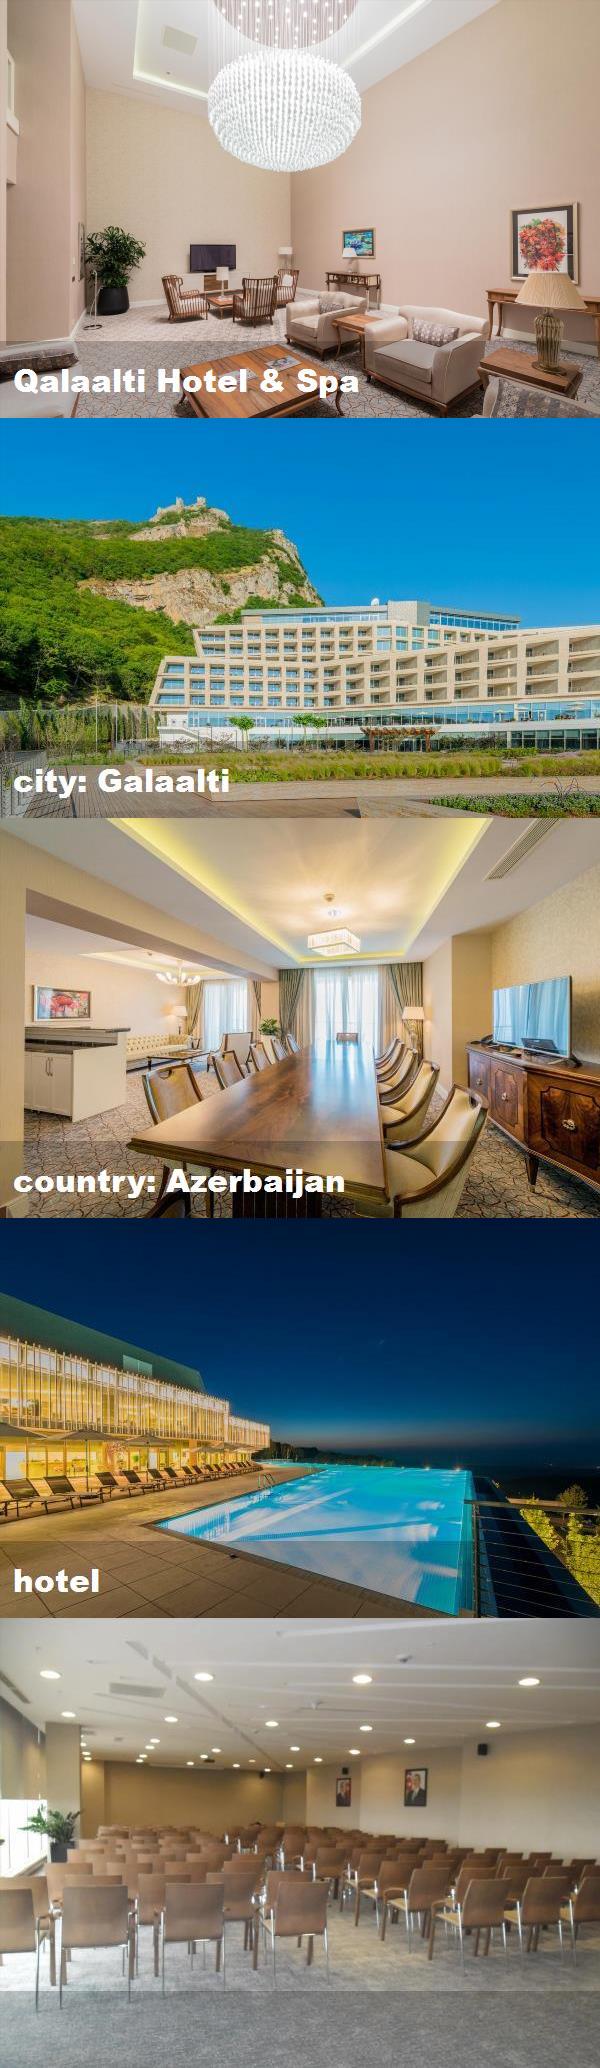 Qalaalti Hotel And Spa City Galaalti Country Azerbaijan Hotel Hotel Hotel Spa Spa